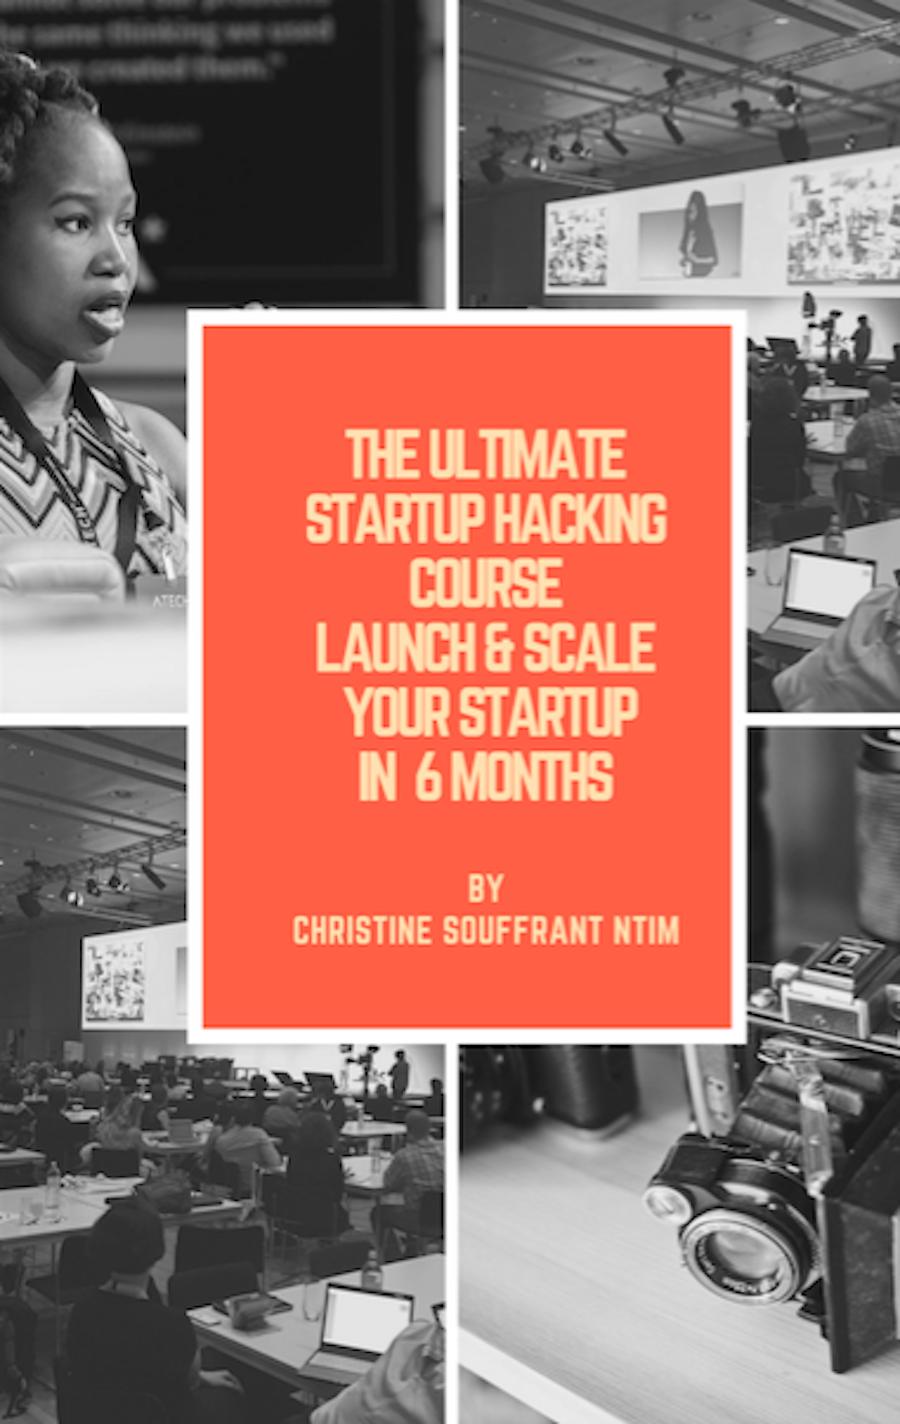 Christine Souffrant Ntim, Venedy, Caribbean Business, Caribbean Entrepreneurs, KOLUMN Magazine, KOLUMN